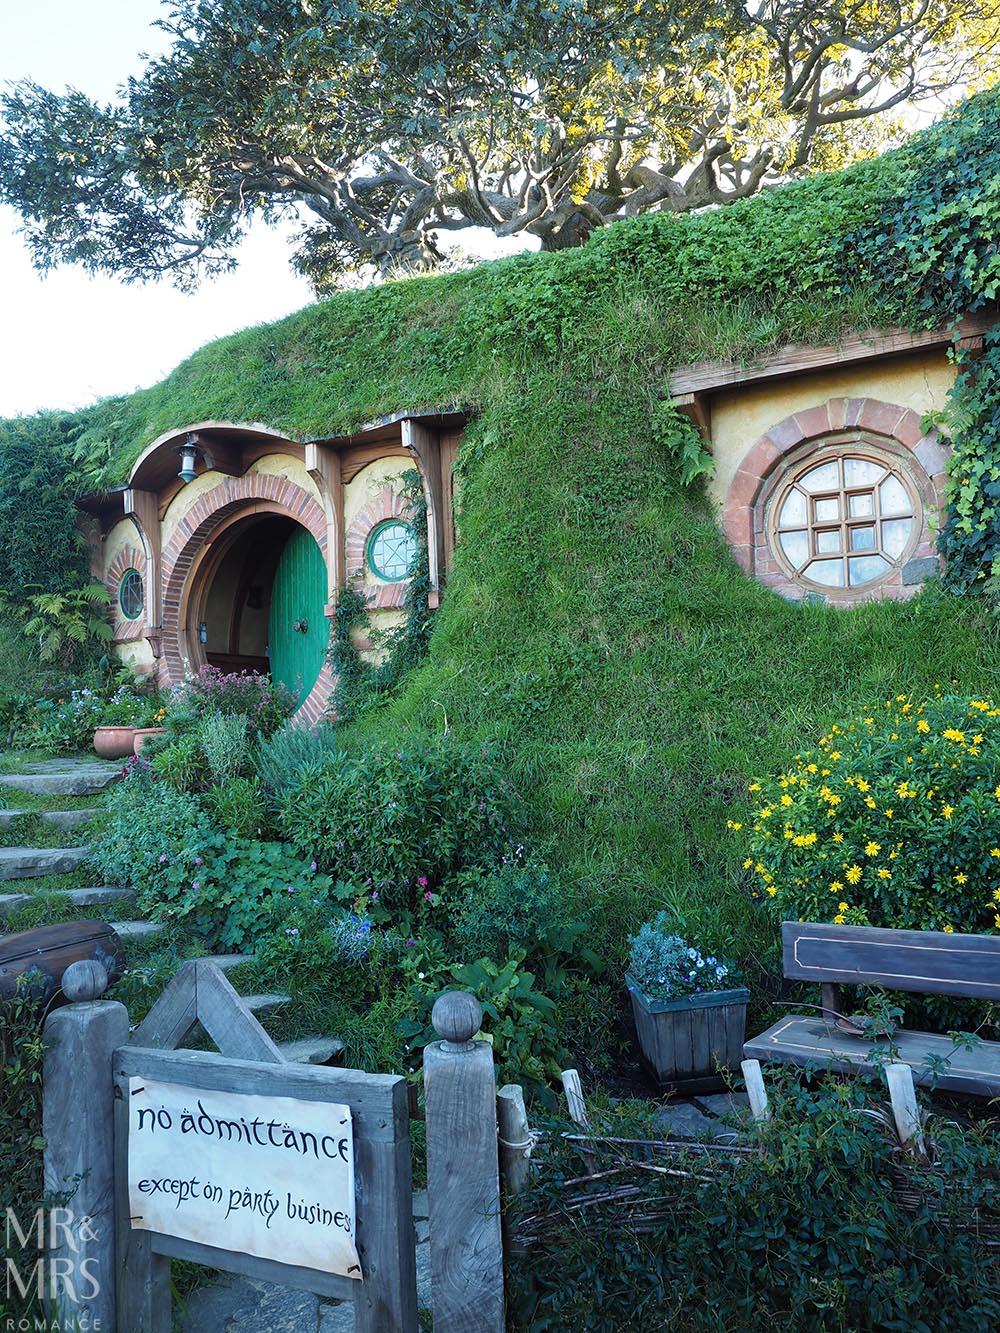 Hobbiton Movie Set, Waikato, New Zealand - Bag End